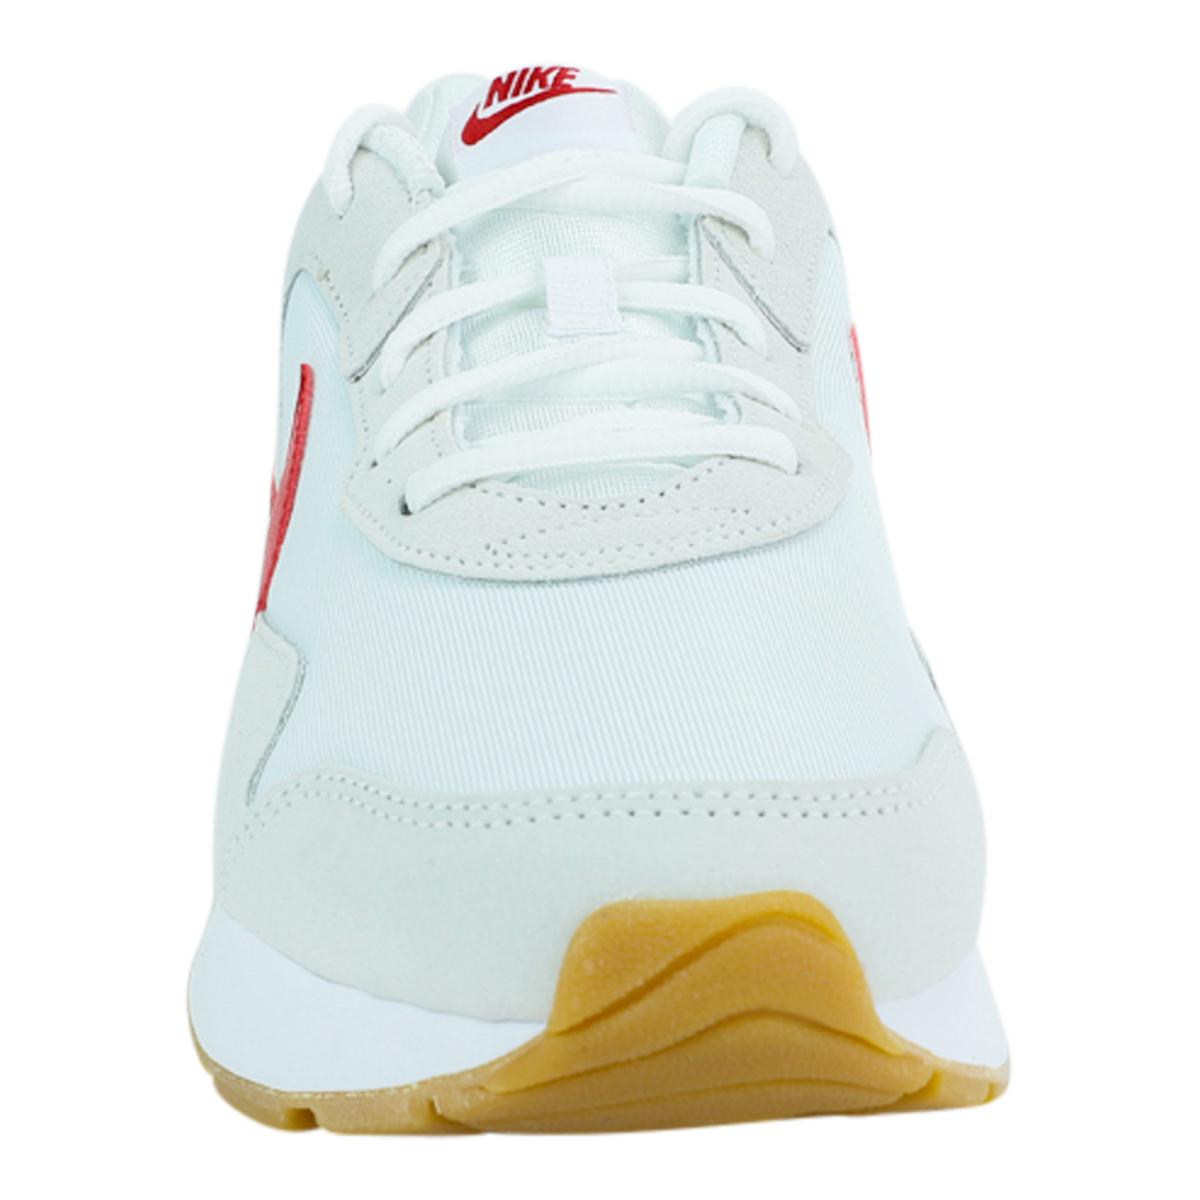 Nike-Men-039-s-Delfine-Running-Shoes thumbnail 19